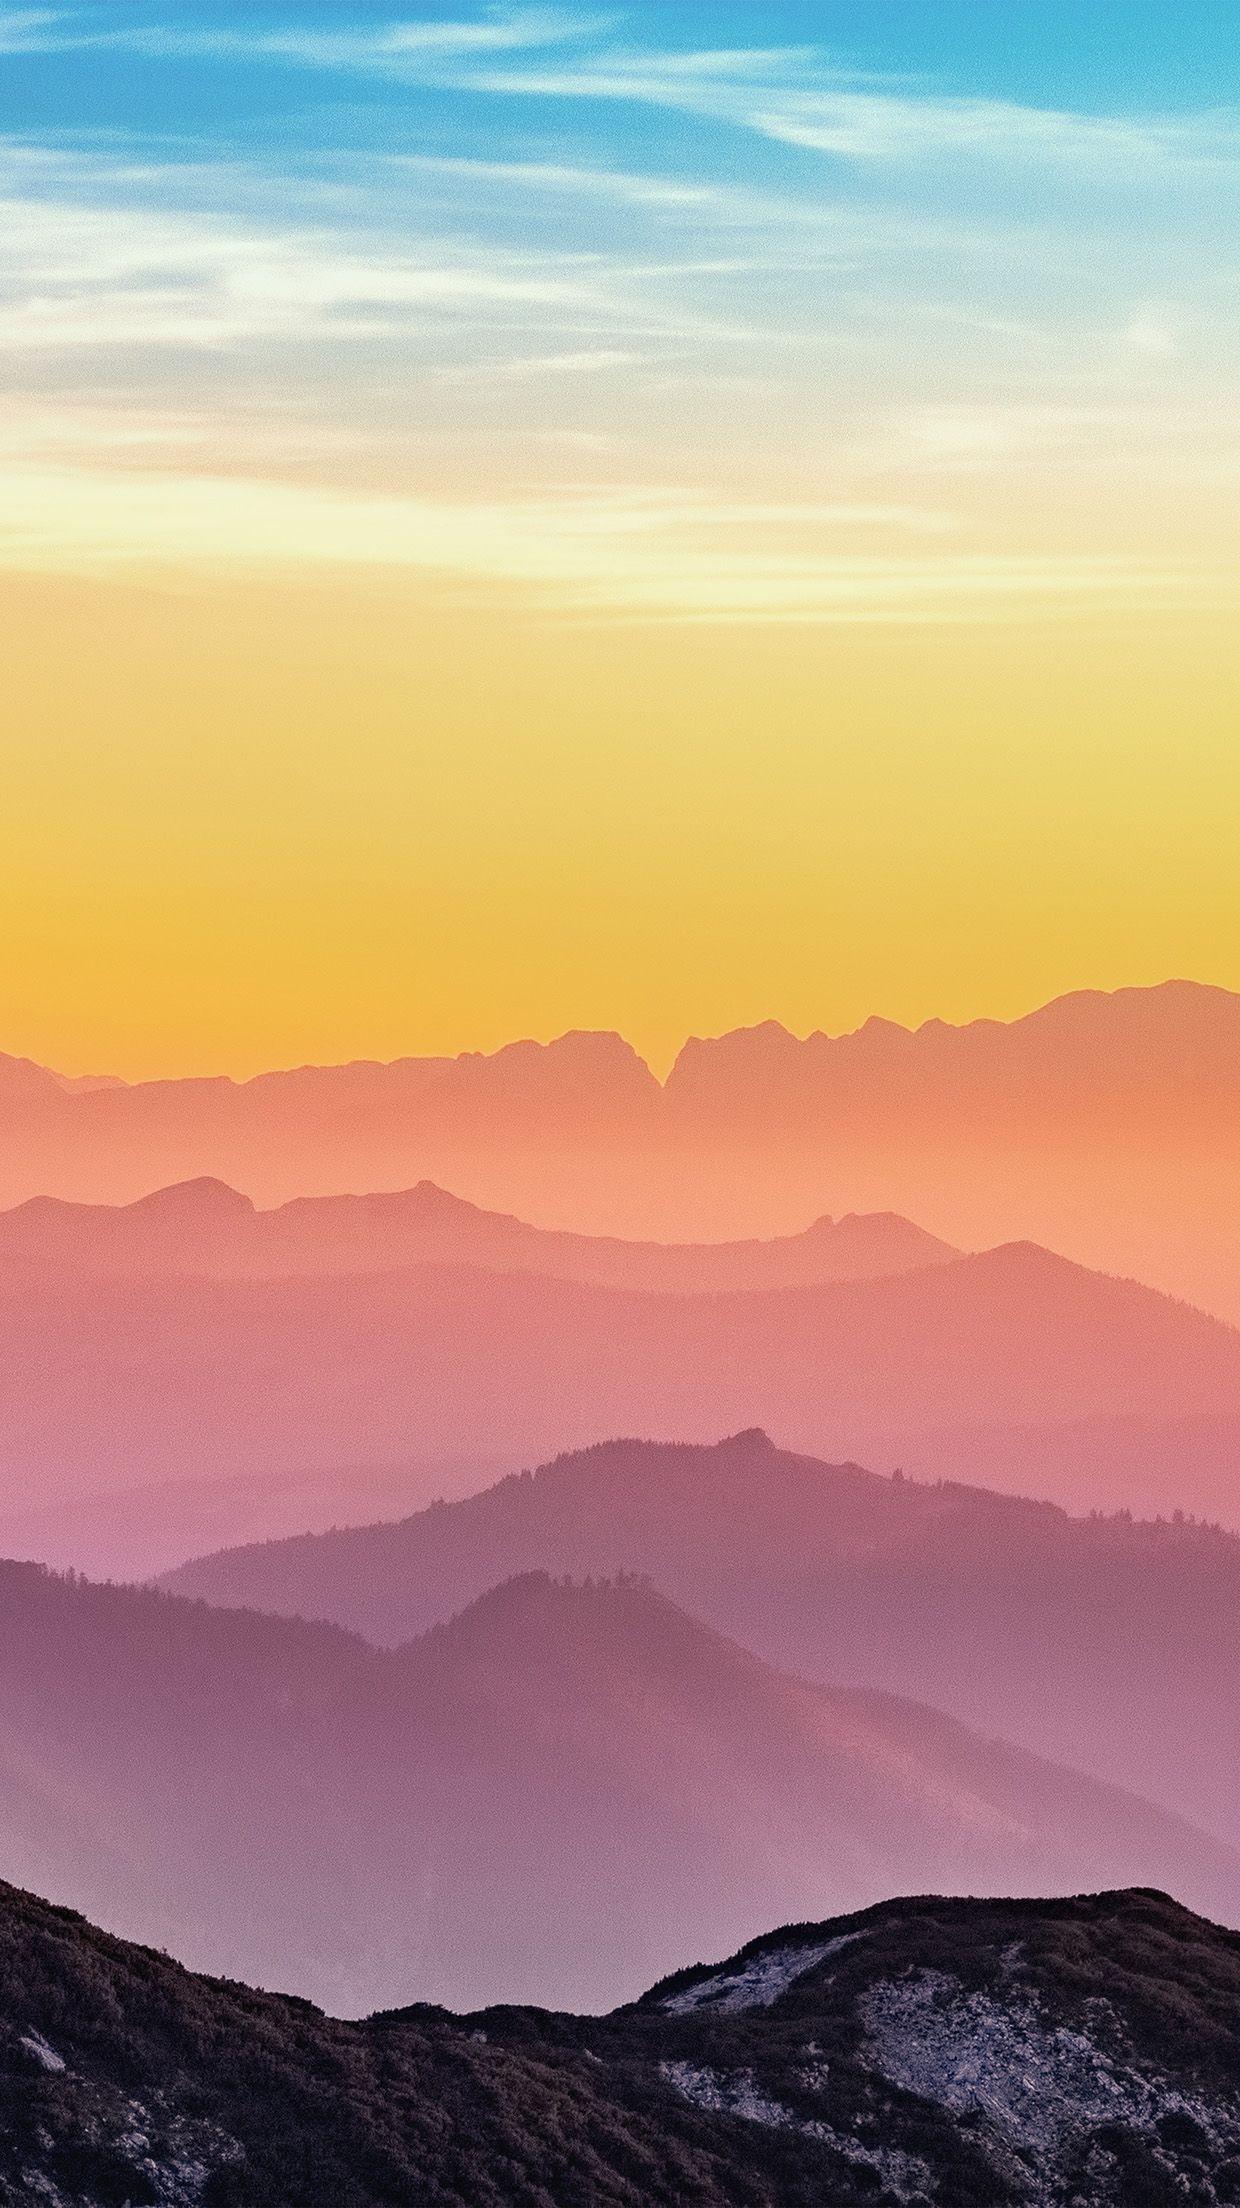 Best Wallpaper Mountain Morning - Morning-Mountains-Sunshine-Fresh-iPhone-Wallpaper-iphoneswallpapers_com  Collection_654662.jpg